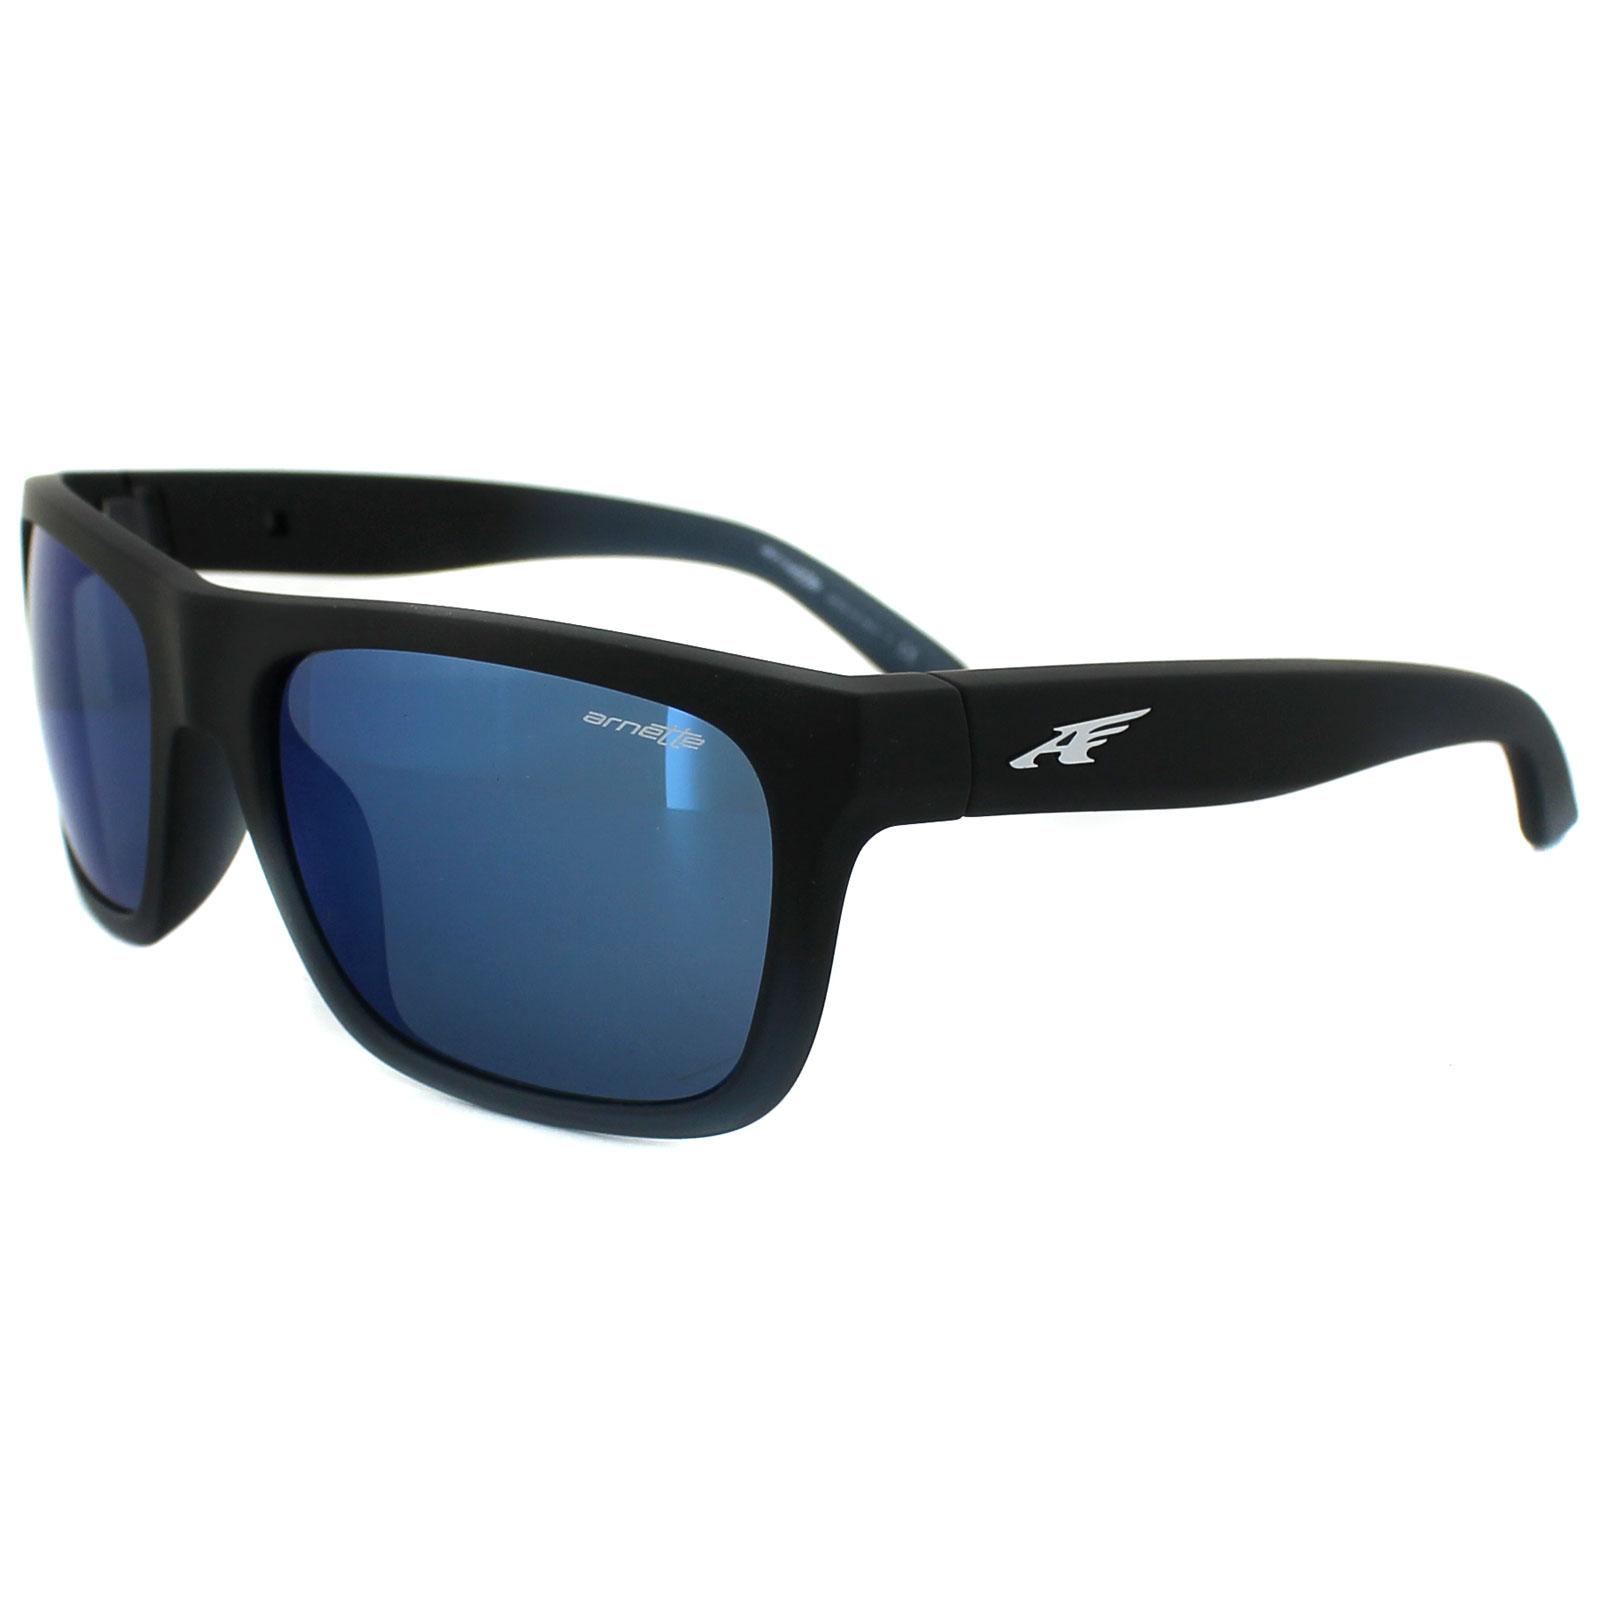 f69531da37109 Arnette Polarized Sunglasses Price